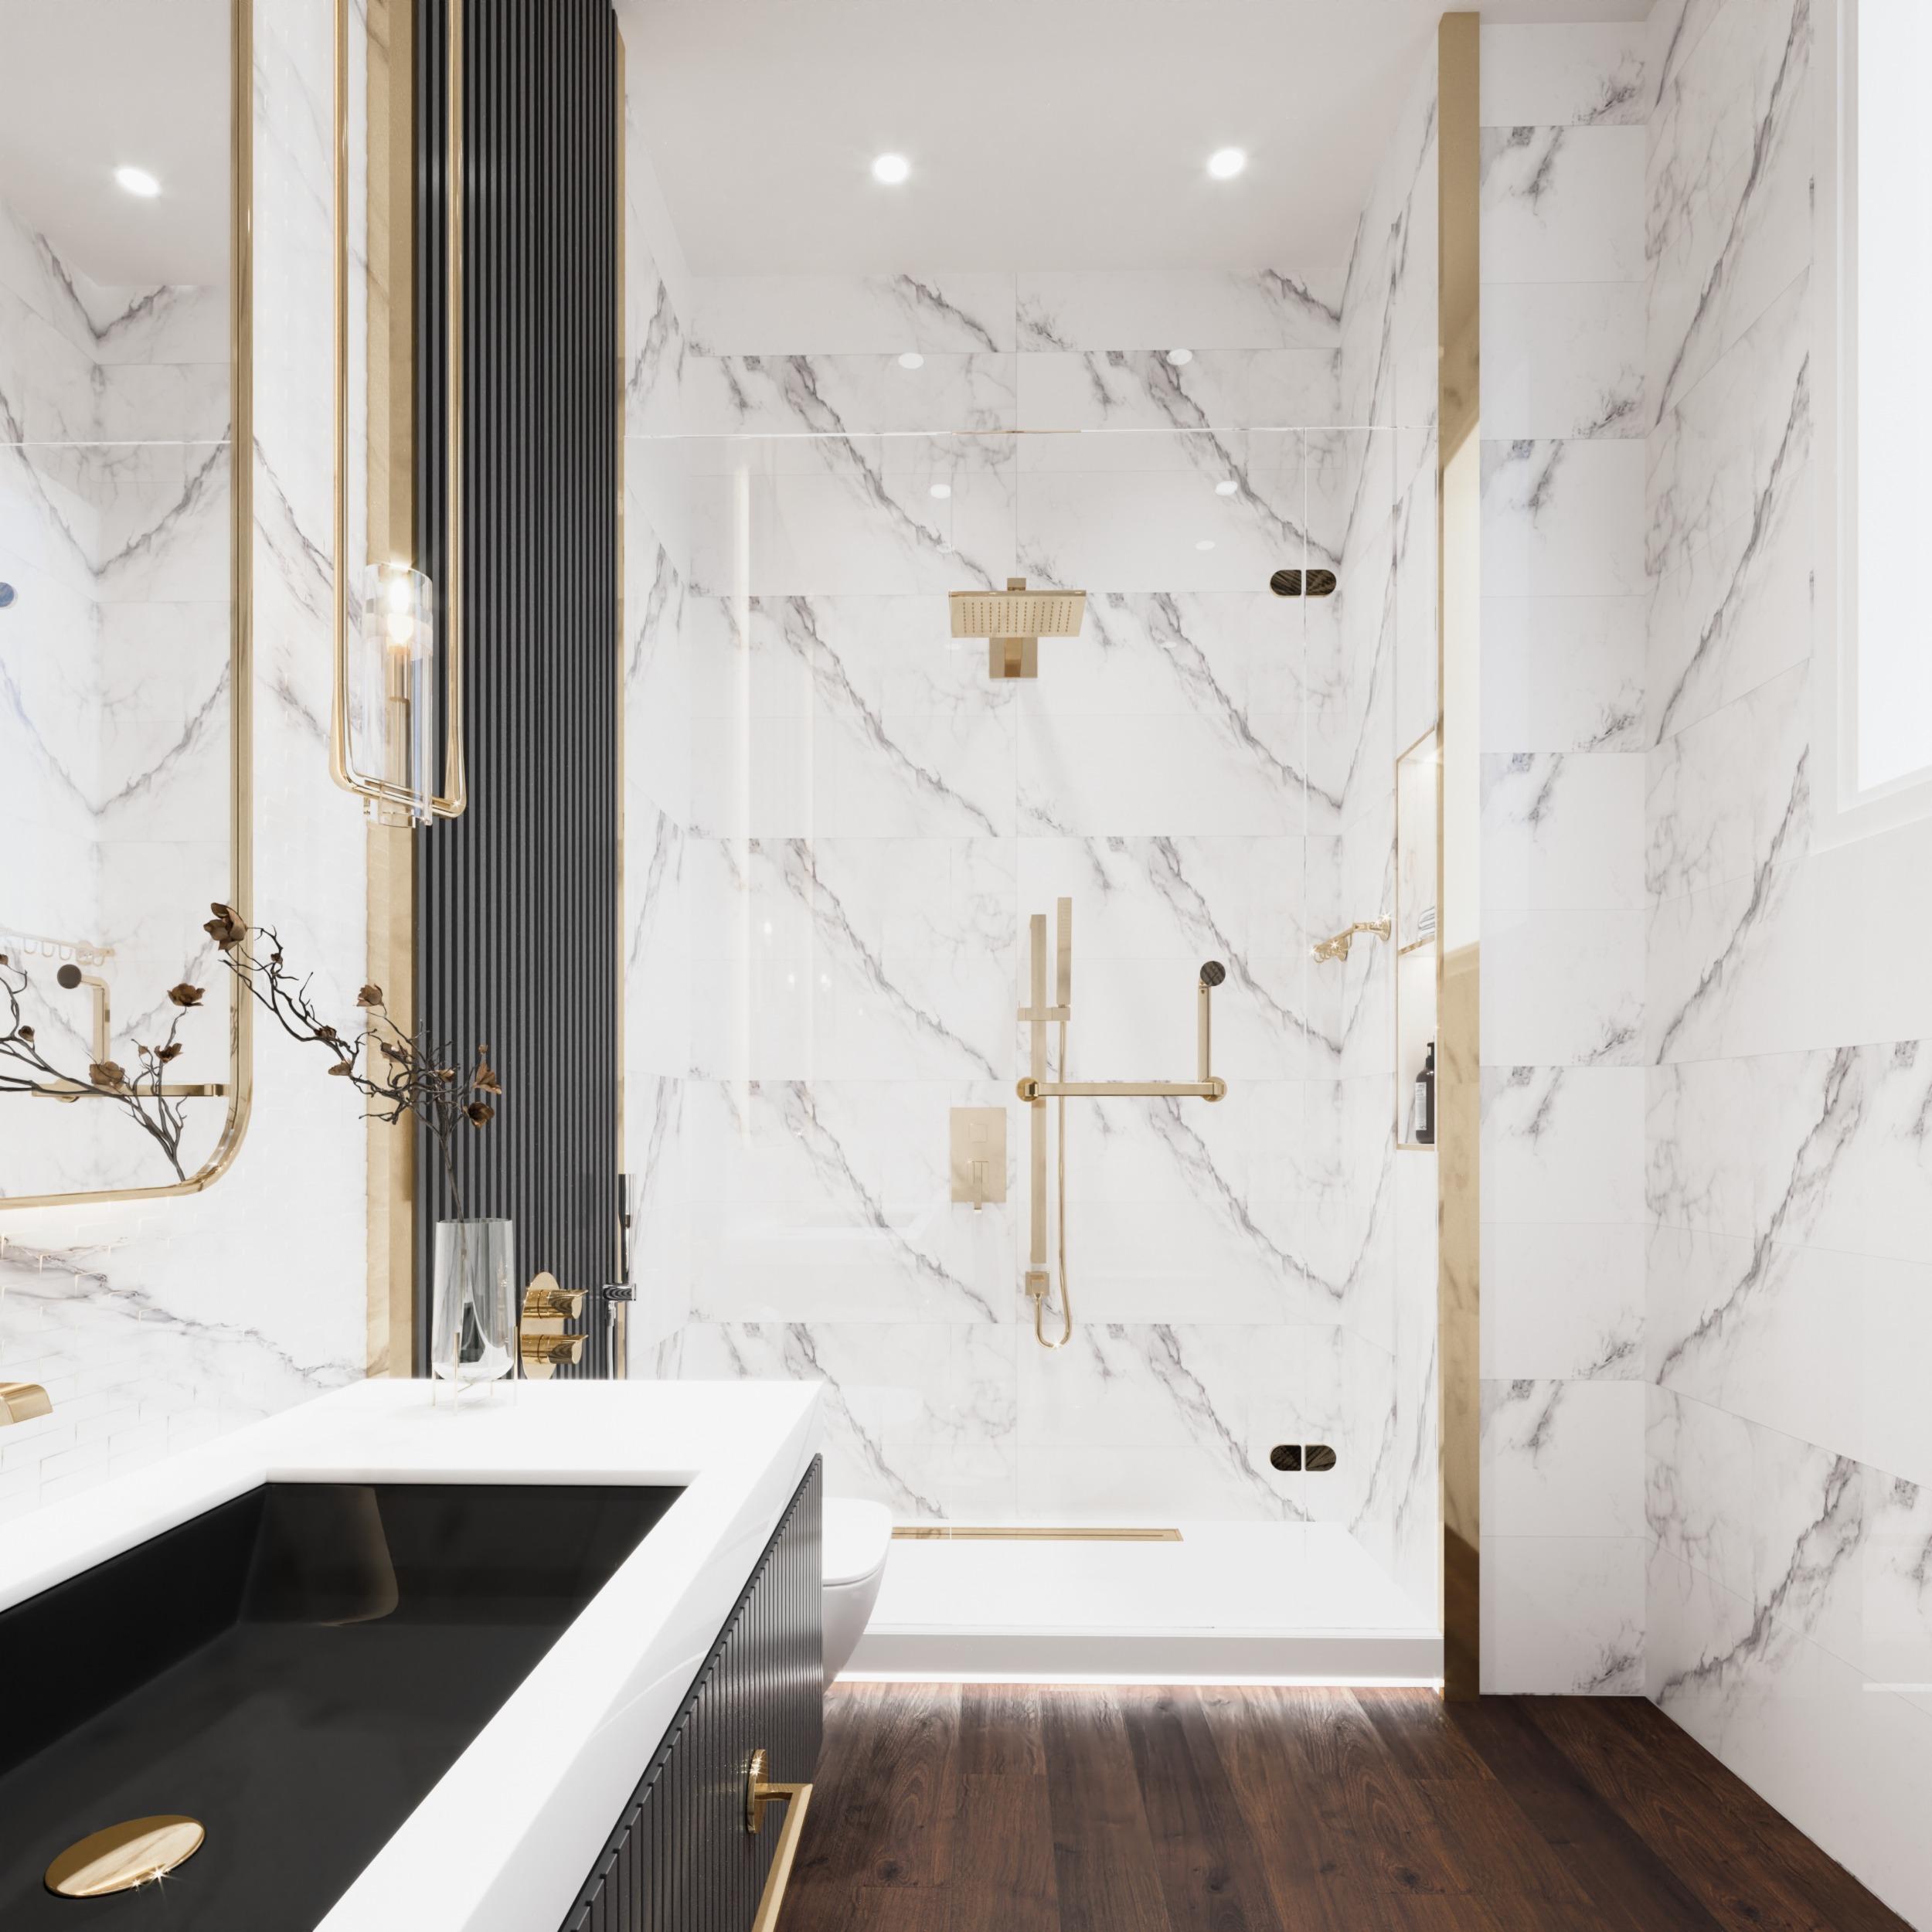 ELEGANT - WELL DESIGNED BATHROOM - BLACK WOODEN STRIPS - GOLD